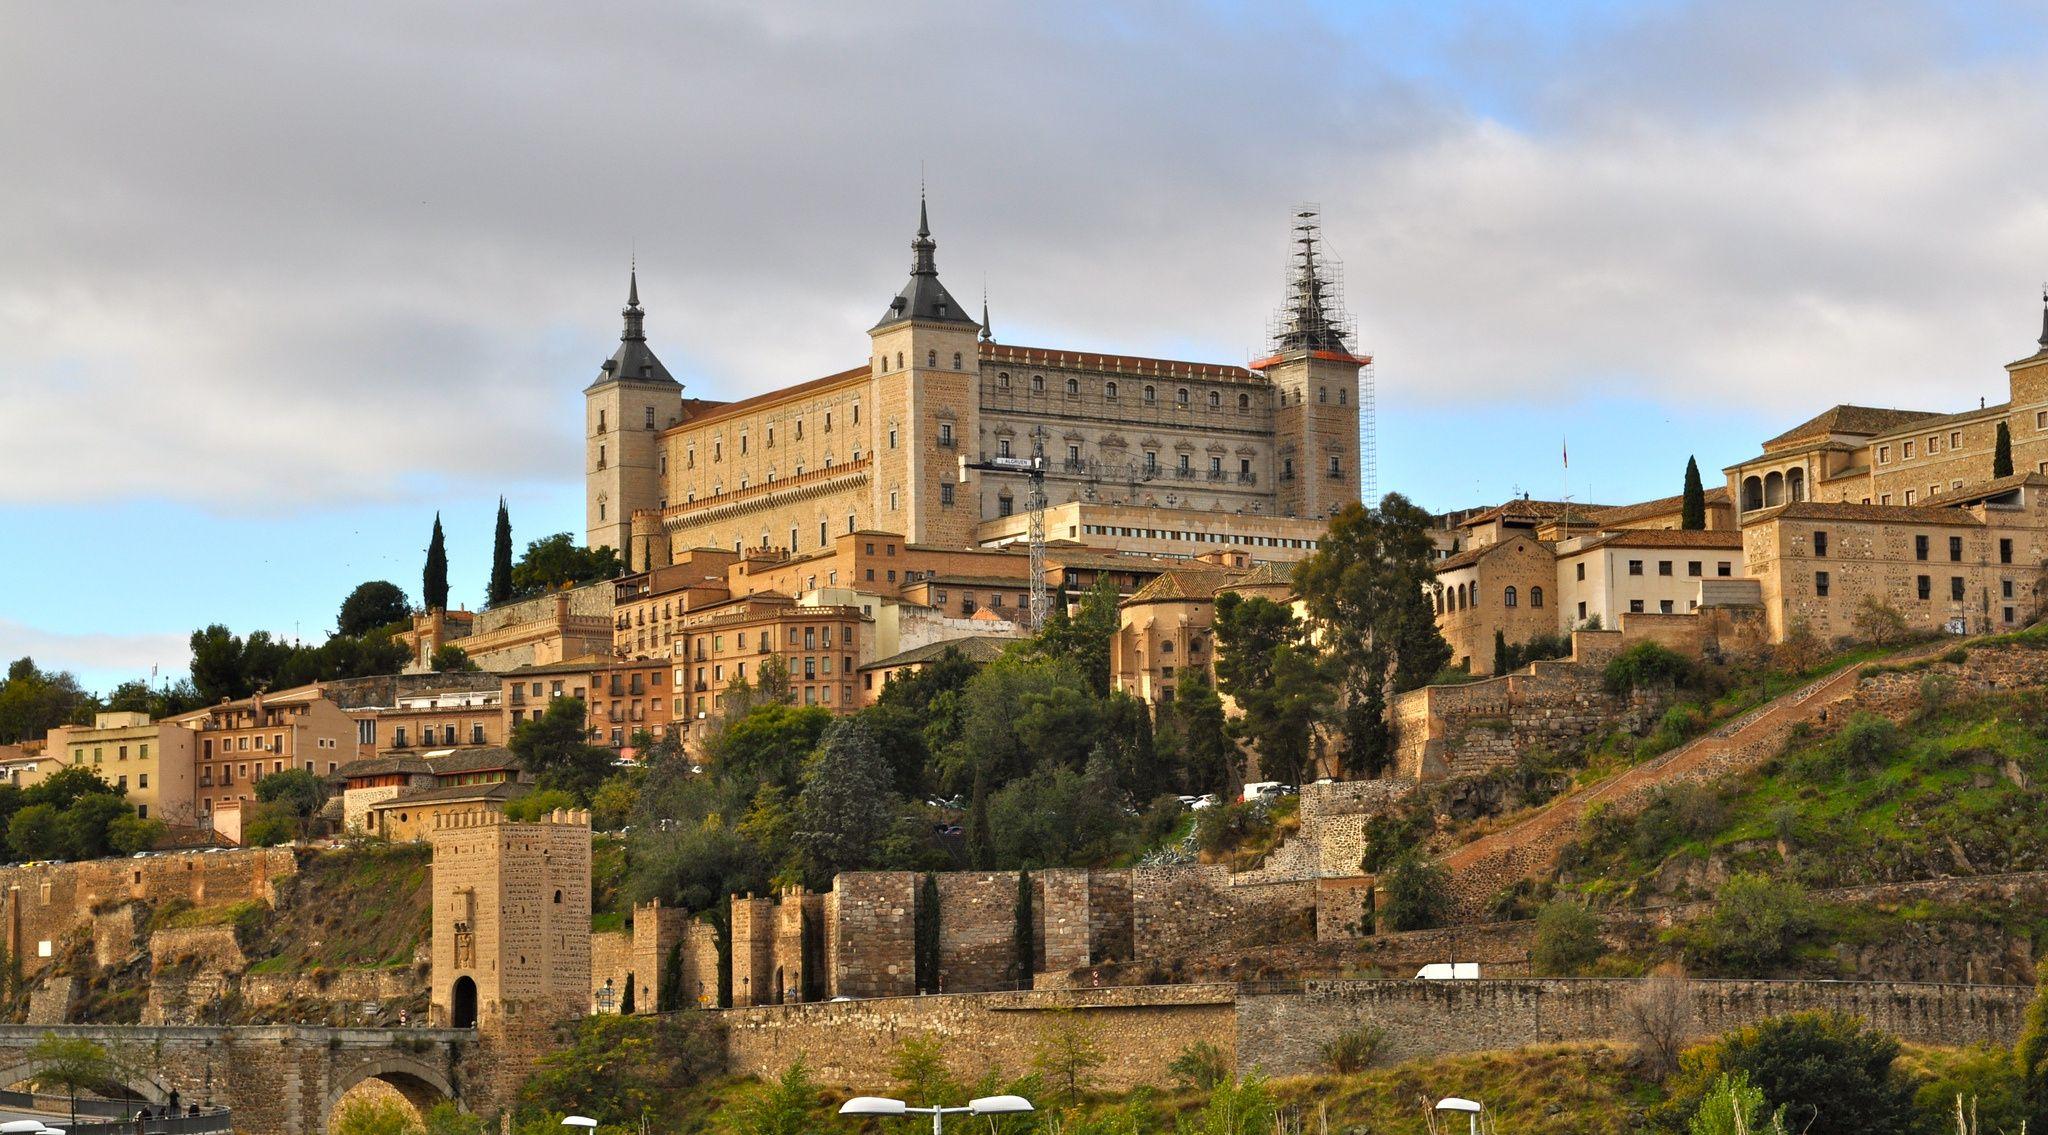 Toledo Spain castle g wallpaper | 2048x1135 | 163468 | WallpaperUP